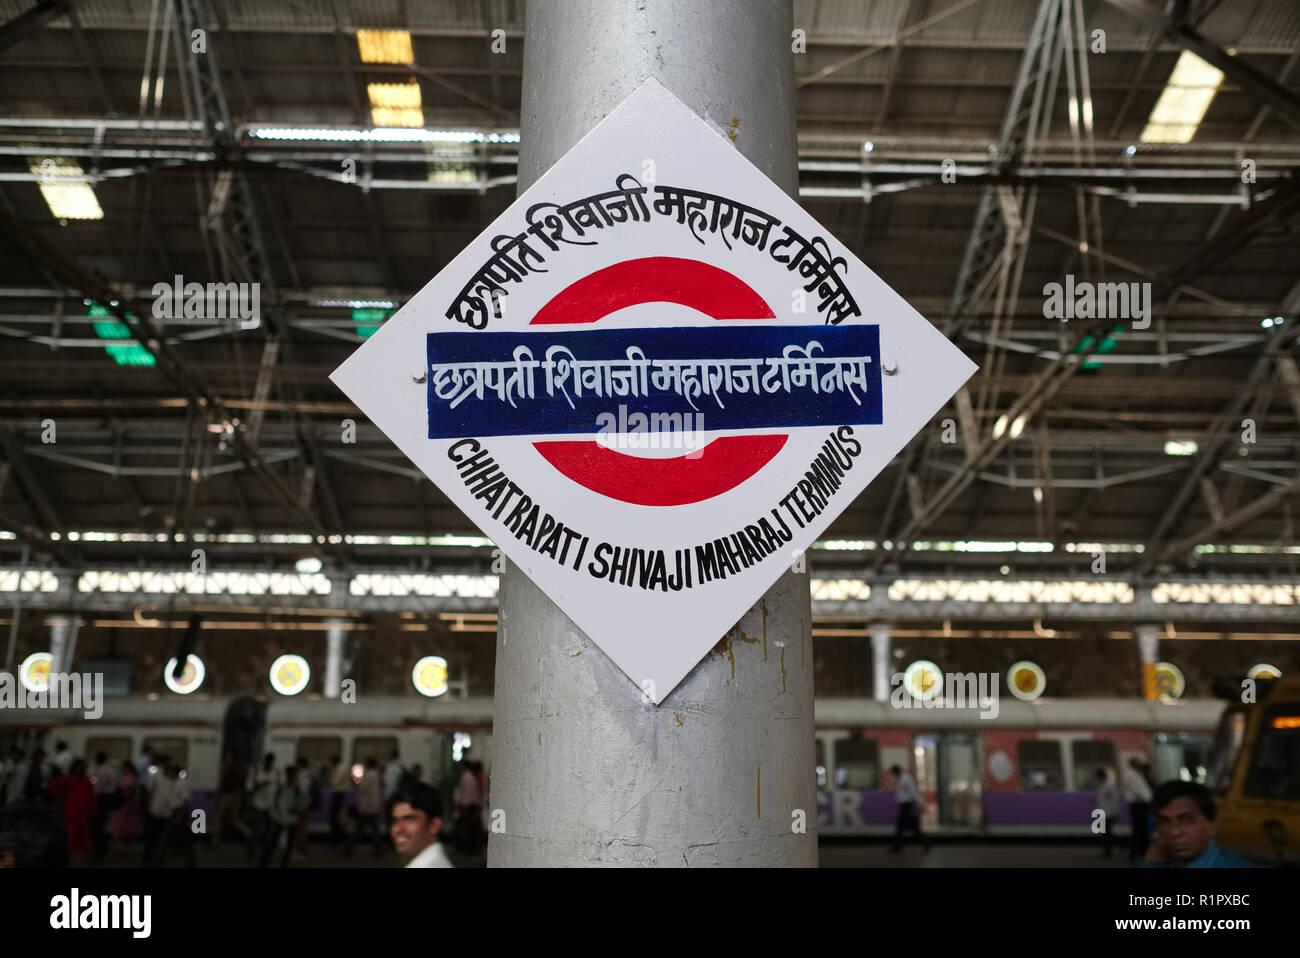 Signboard in Chhatrapati Shivaji Maharaj Terminus (CSMT) in Mumbai, India, formerly Chhatrapati Shivaji Terminus, the city's busiest railway station - Stock Image